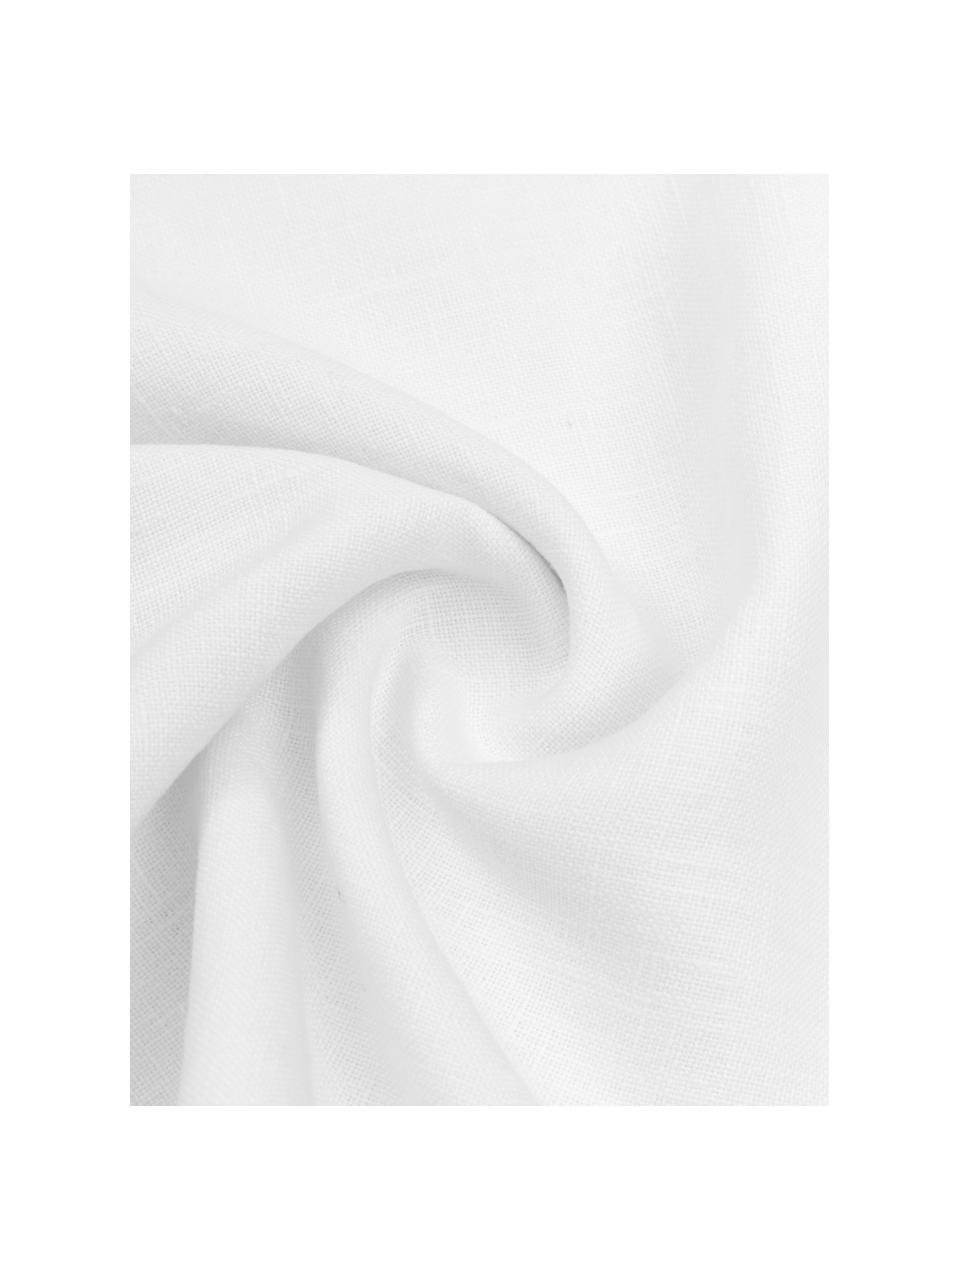 Linnen kussenhoes Luana in crèmewit met franjes, 100% linnen, Crèmewit, 30 x 50 cm